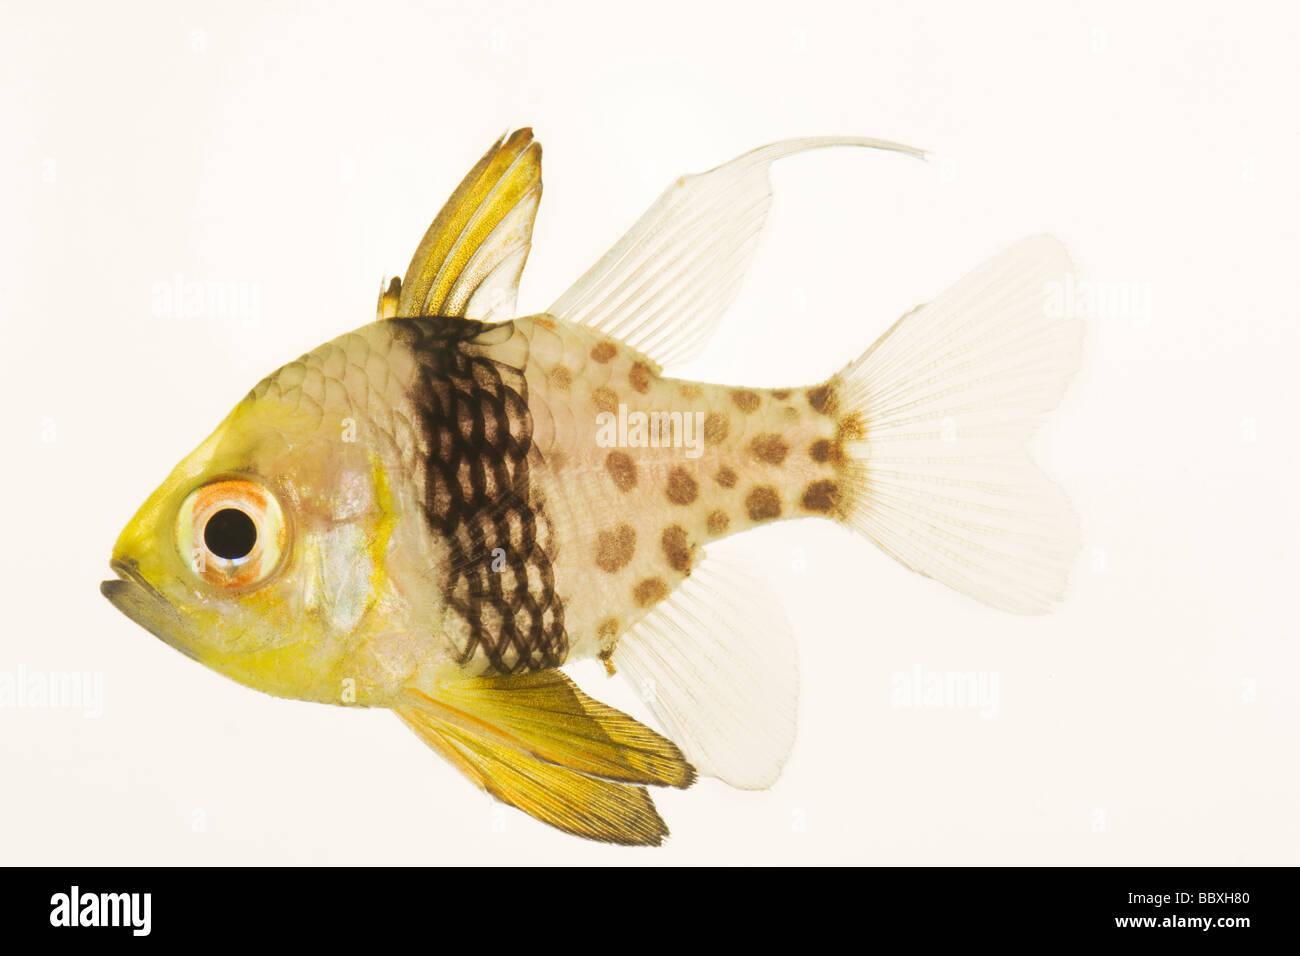 Polka Dot Kardinal Fische Sphaeramia Nematoptera Carnivorious tropischen marine Riff-Fische Stockbild